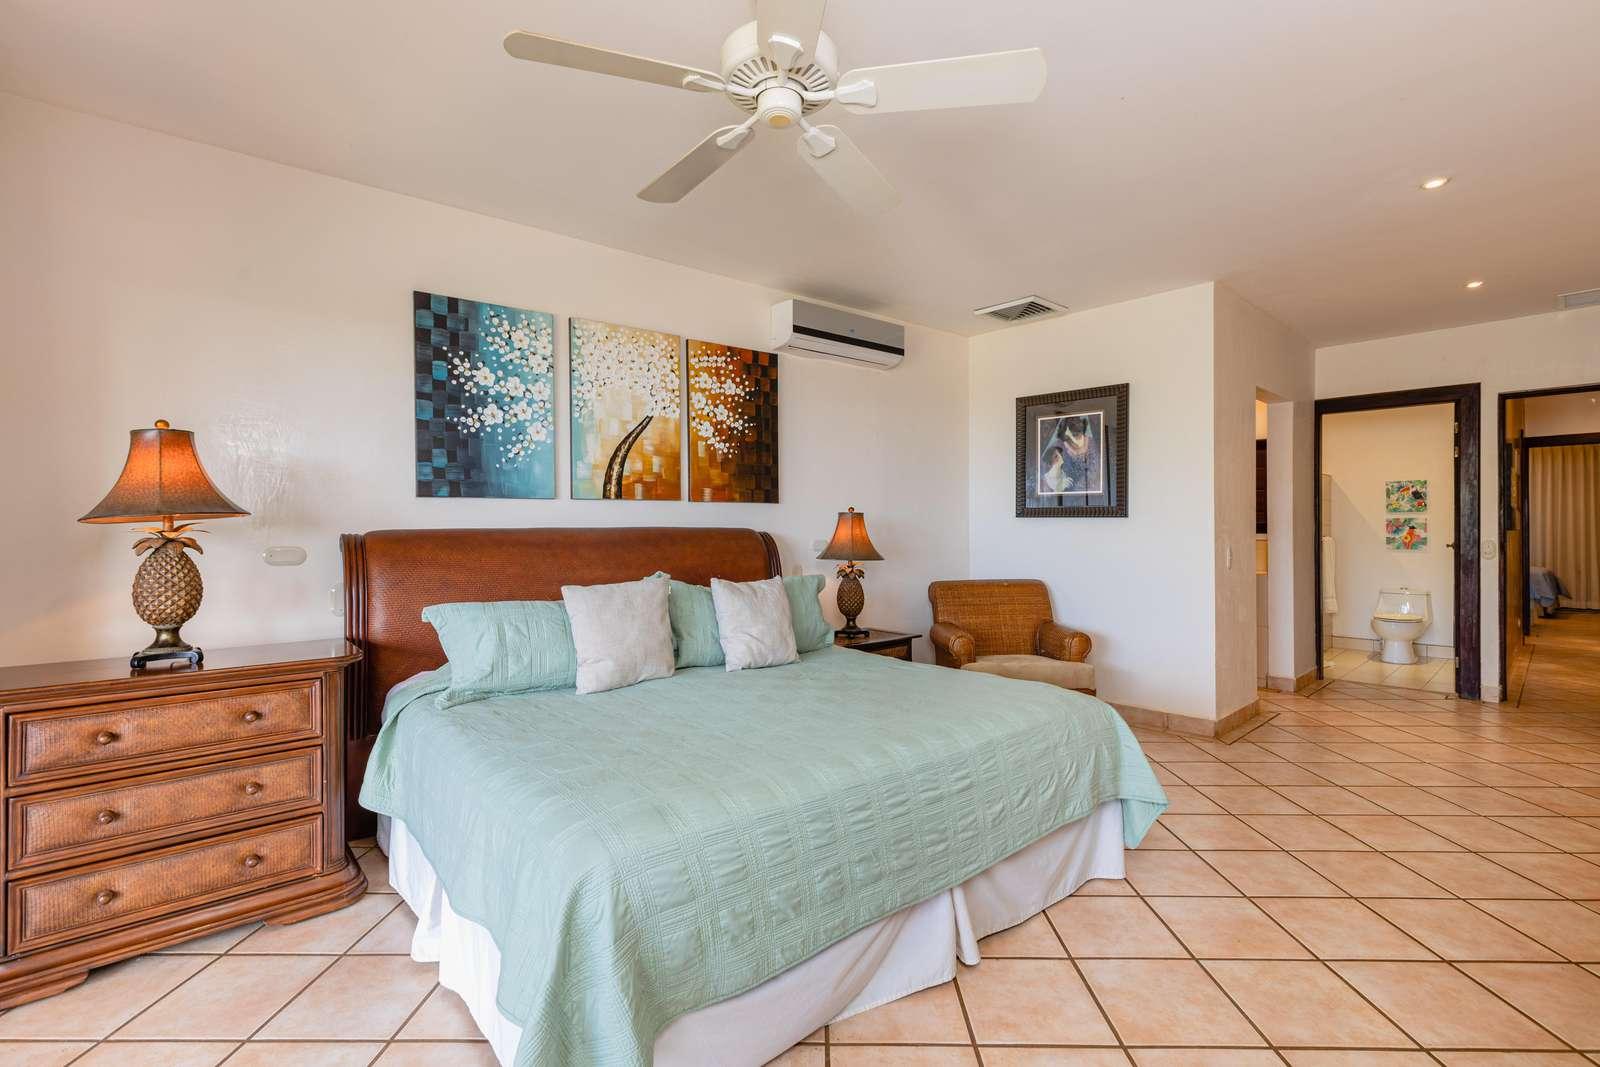 Master bedroom, king bed, private full bathroom